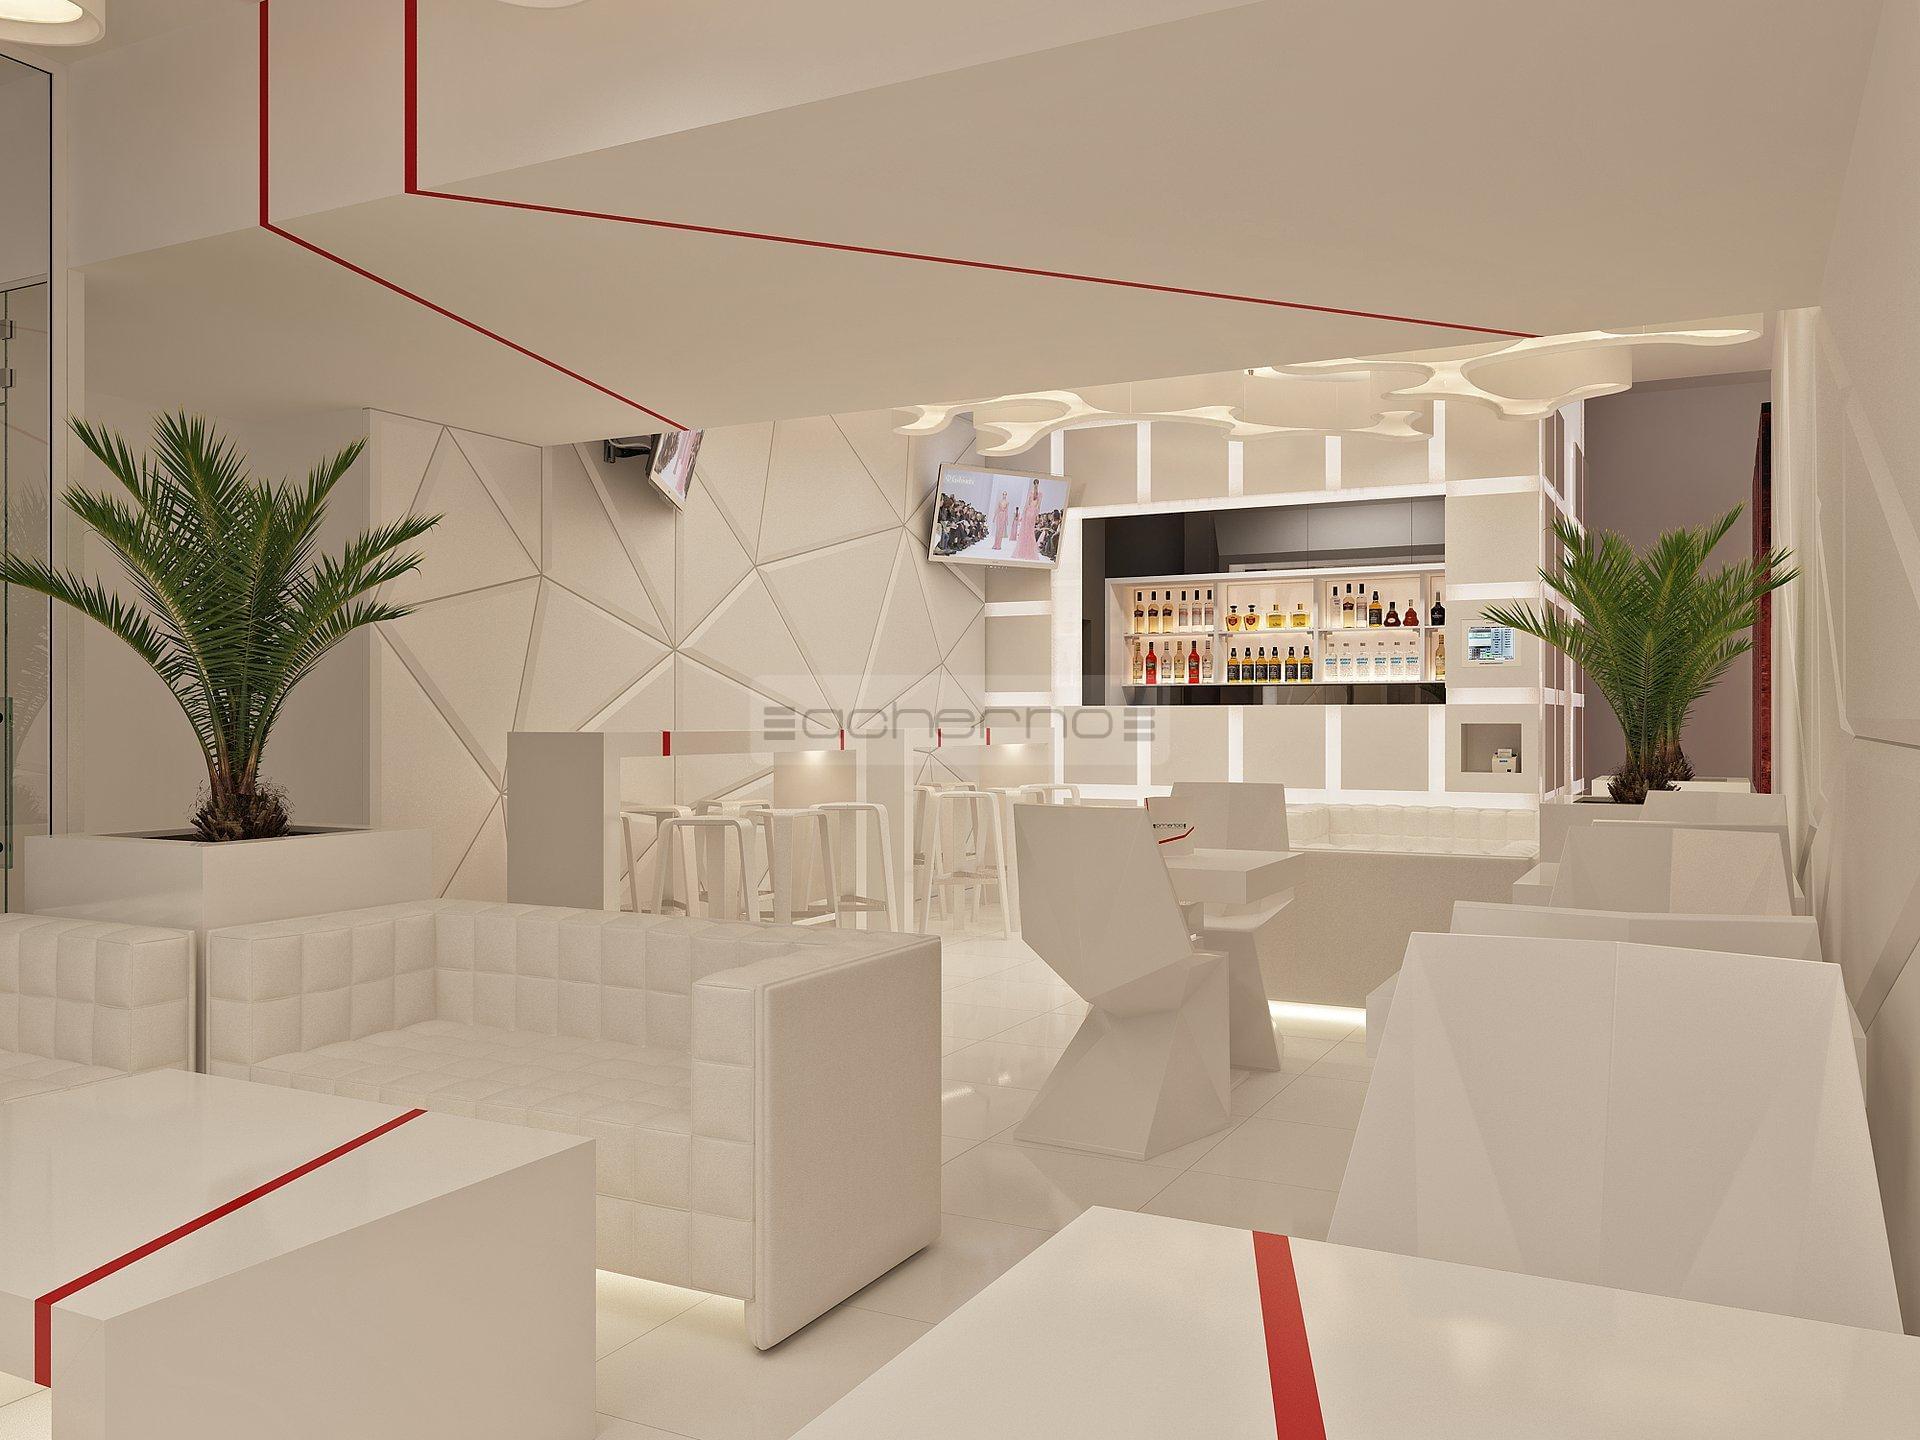 Acherno raumgestaltung club per anhalter durch die galaxis for Raumgestaltung cafe